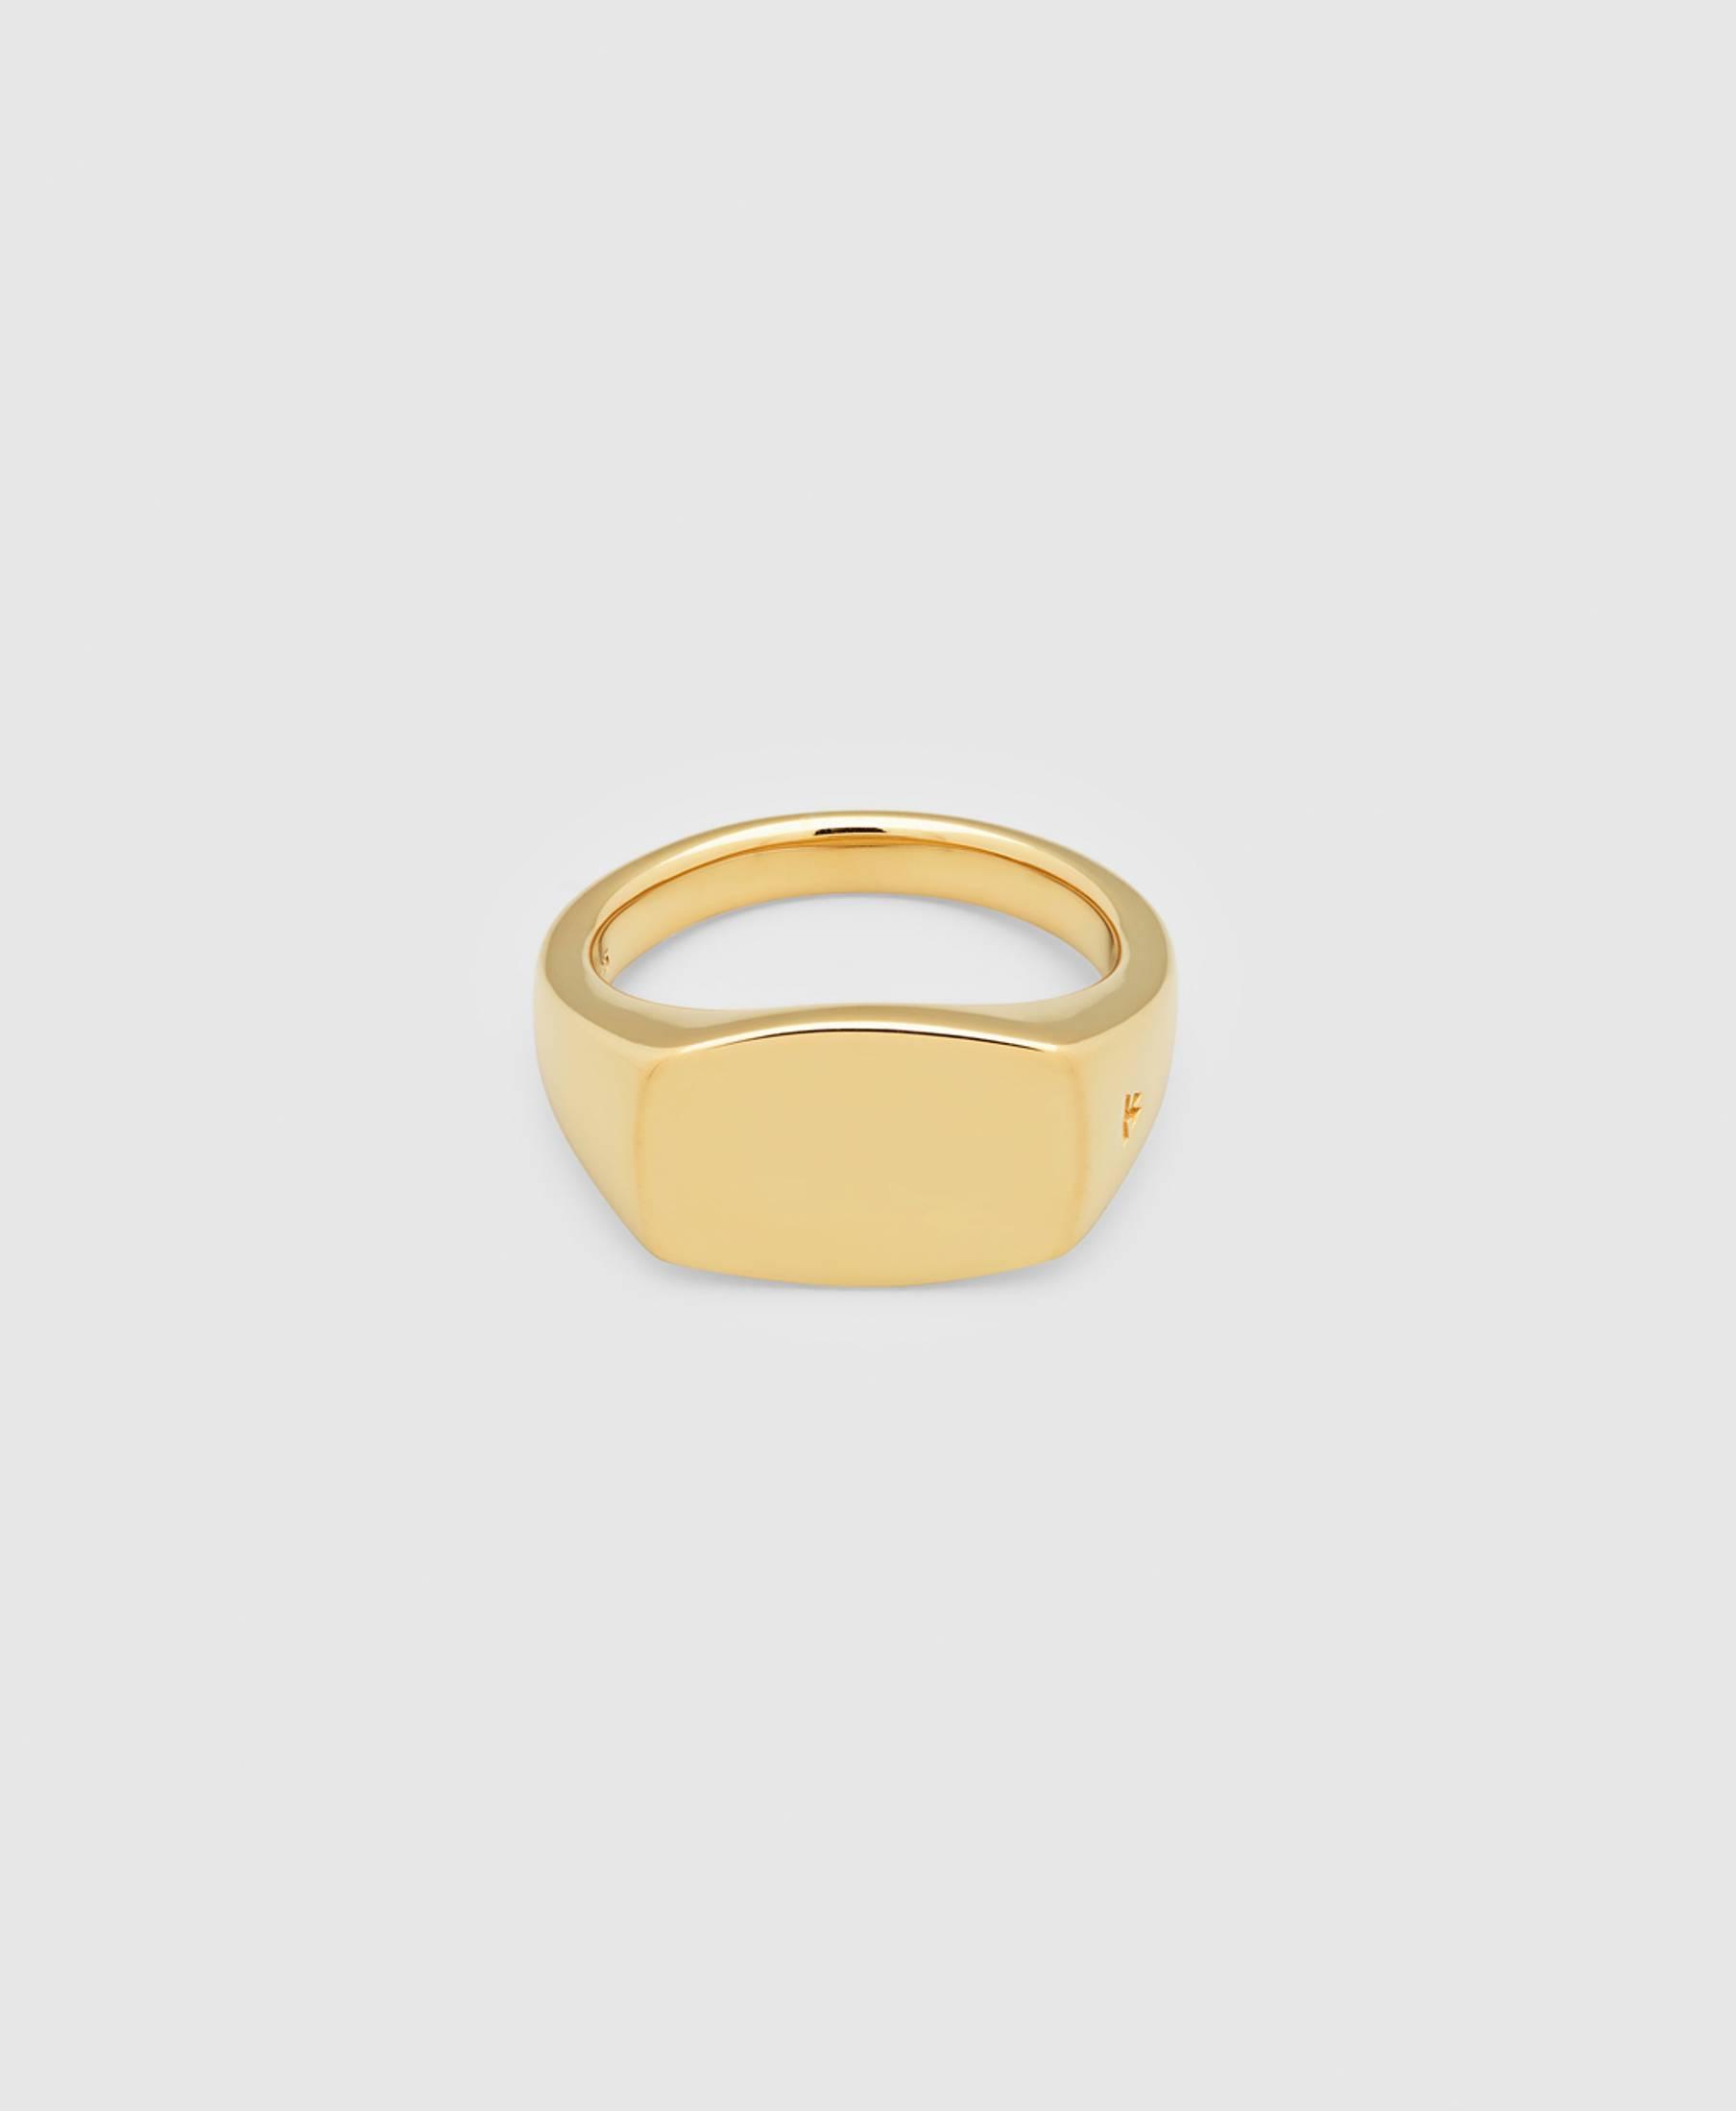 Michael Ring Gold